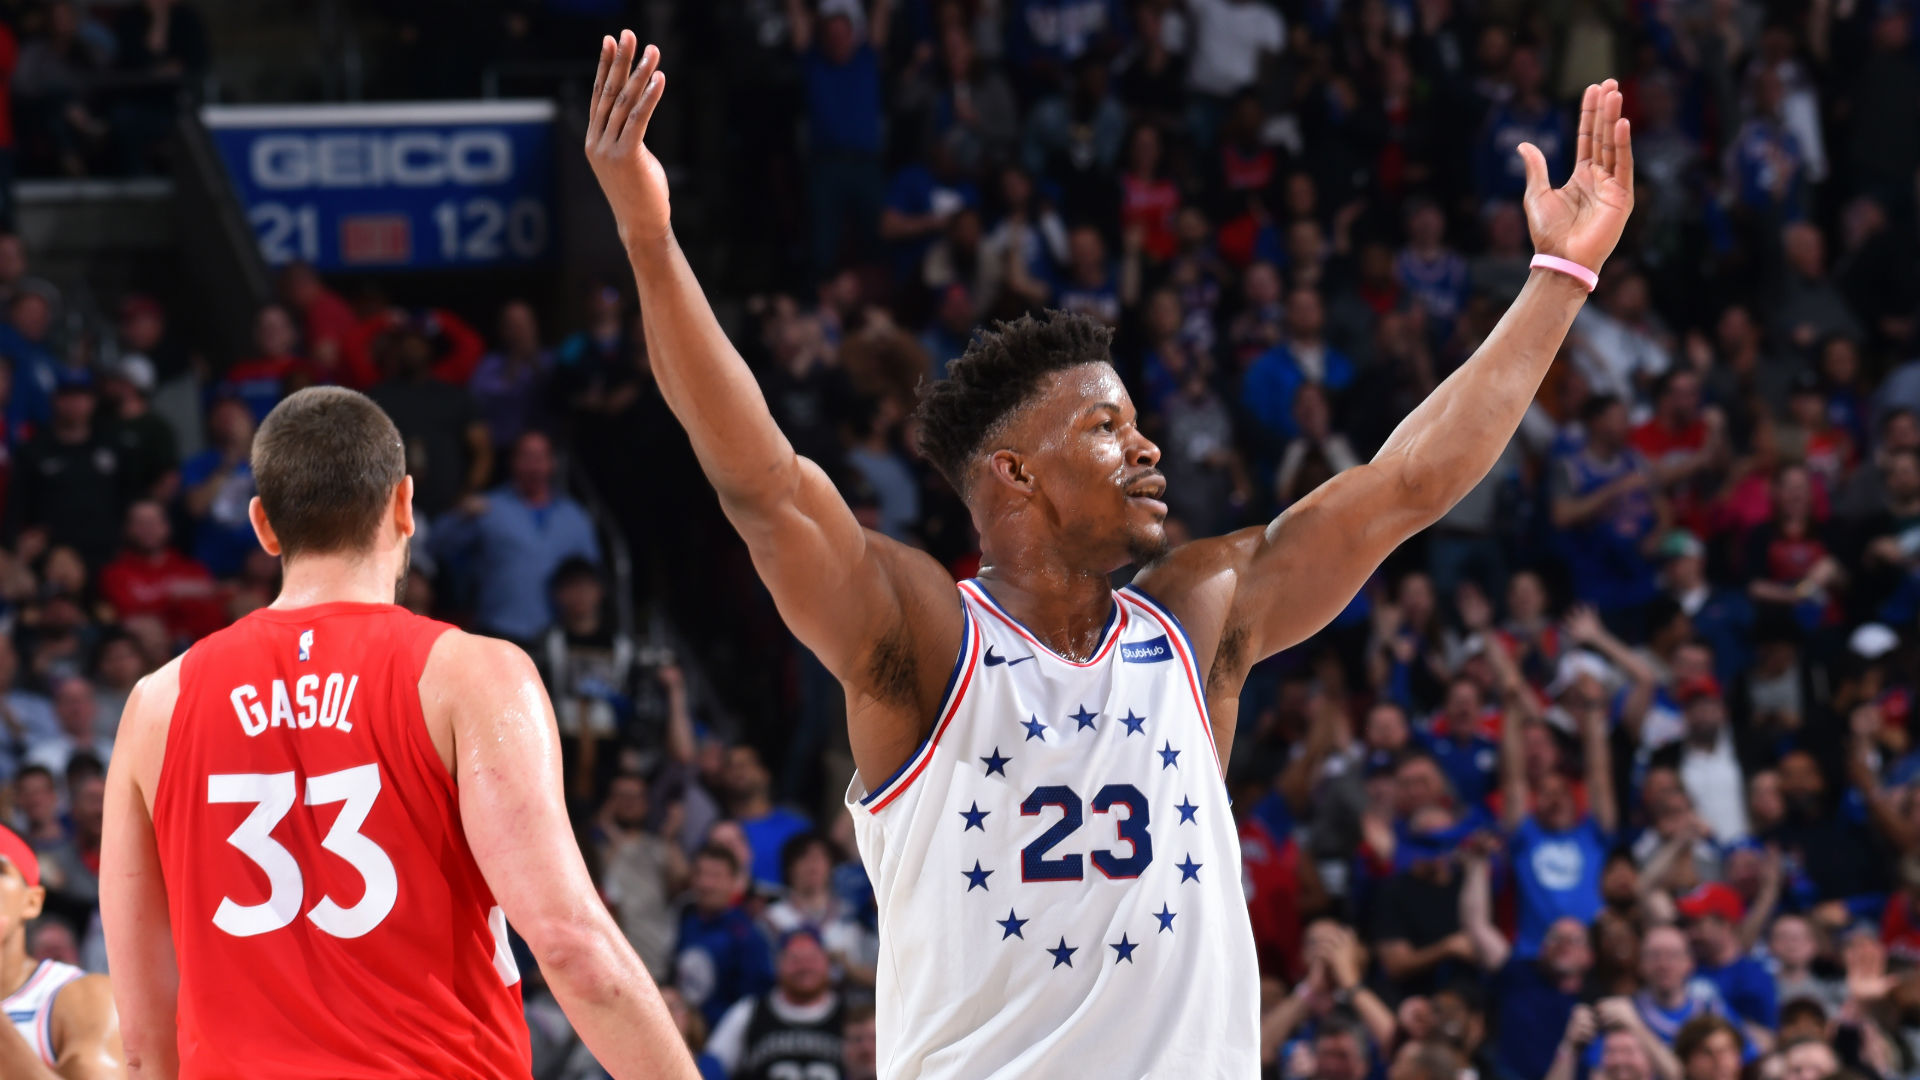 Nba Playoffs 2019 Toronto Raptors Vs Philadelphia 76ers